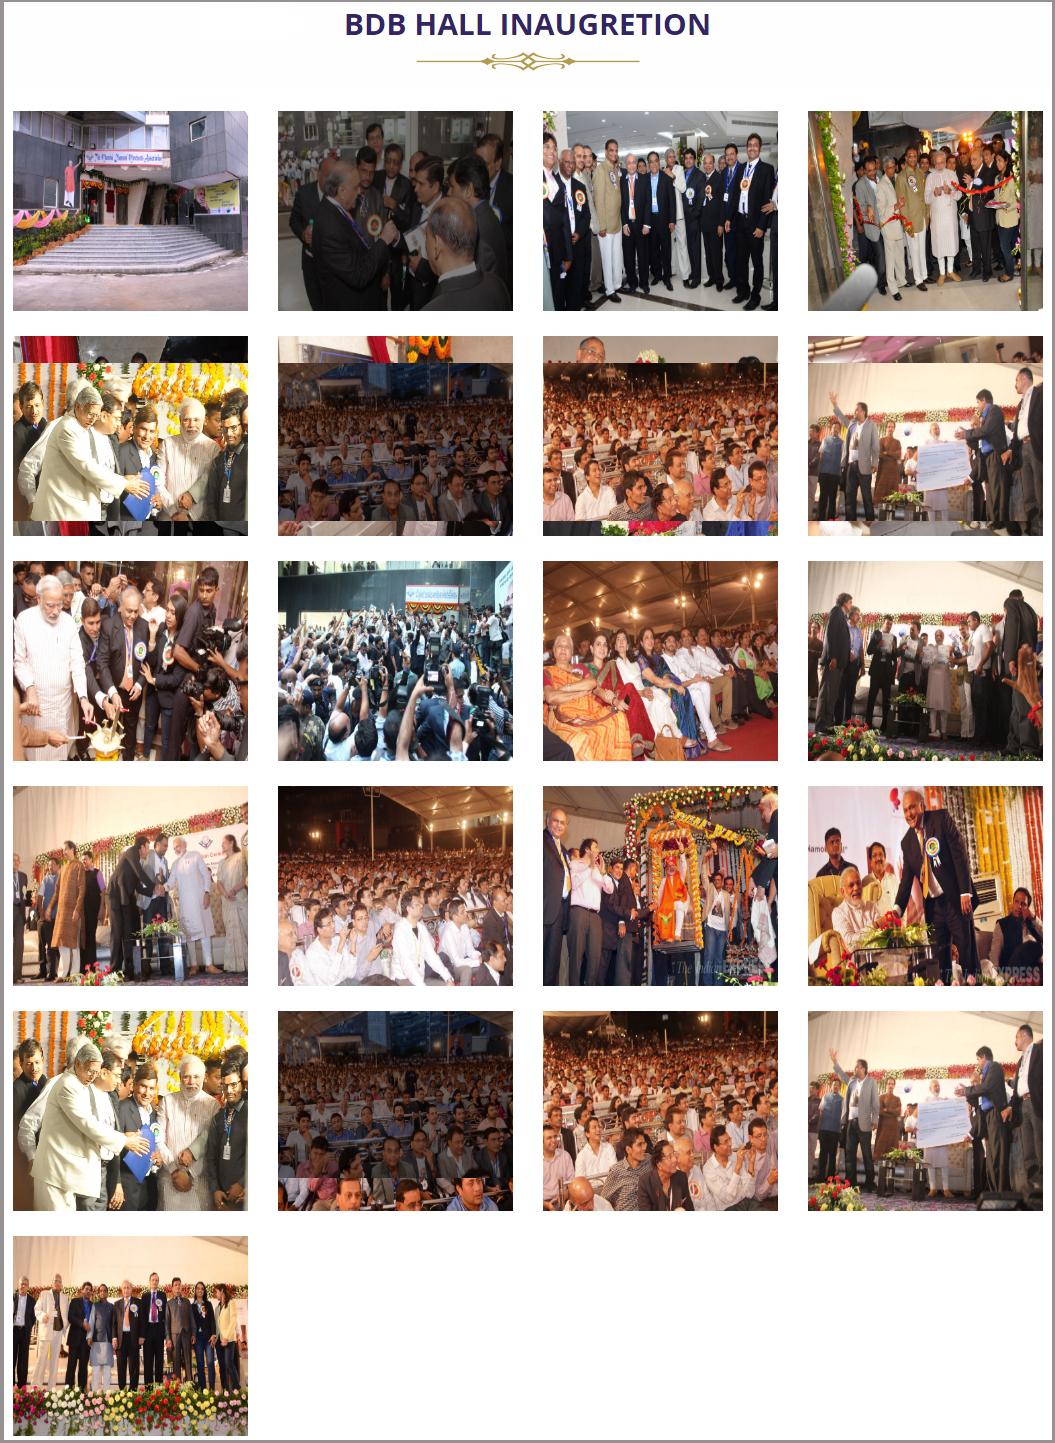 C:\Users\Lenovo\Desktop\FC\Modi's speech in  inauguration of Diamond Hall of Bharat Diamond Bourse2.png